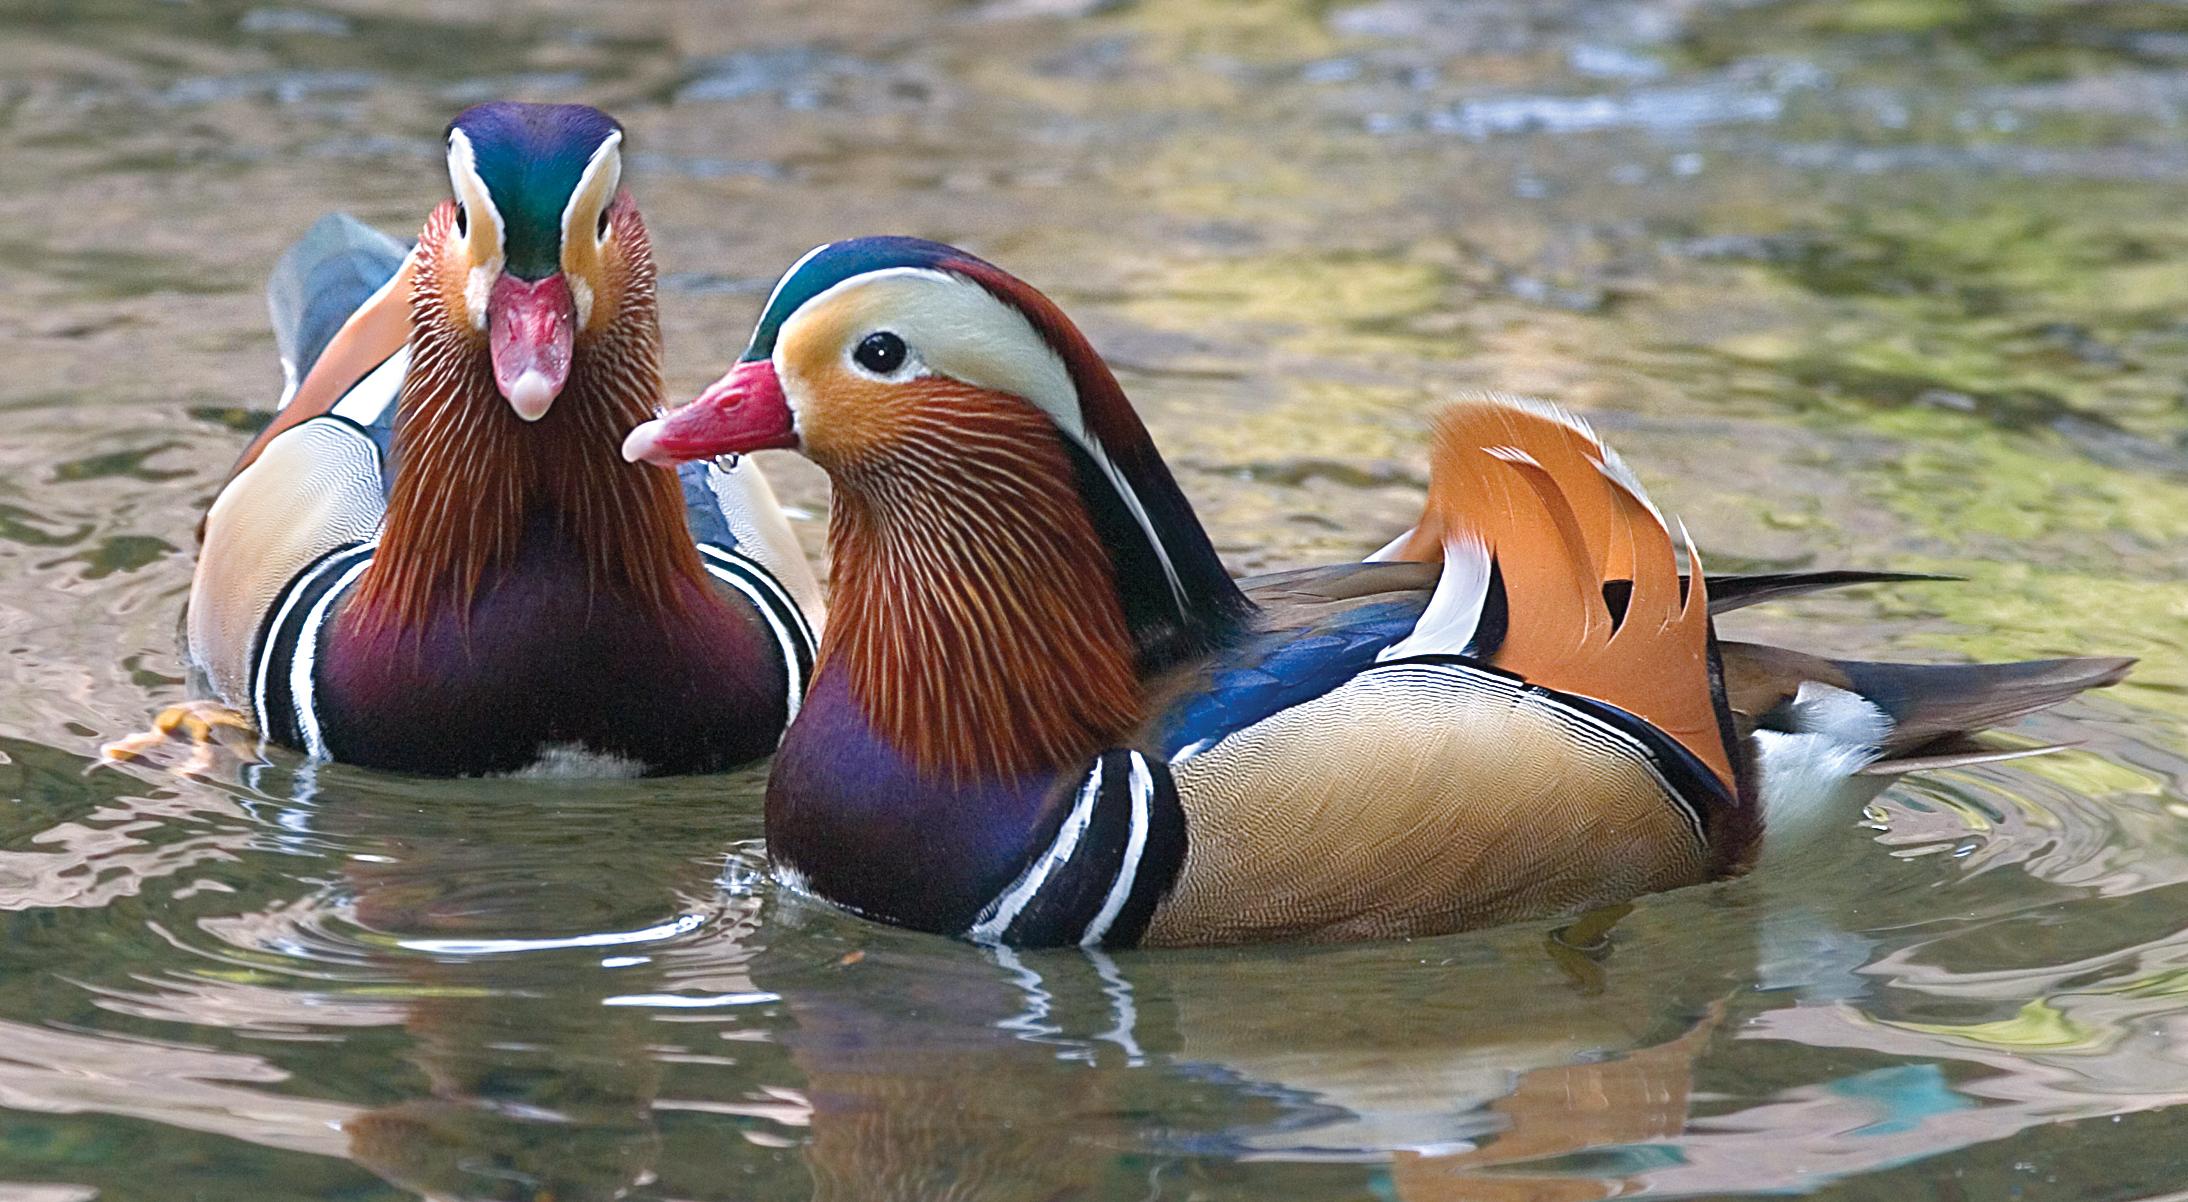 Rick Sammon's Birds033.jpg